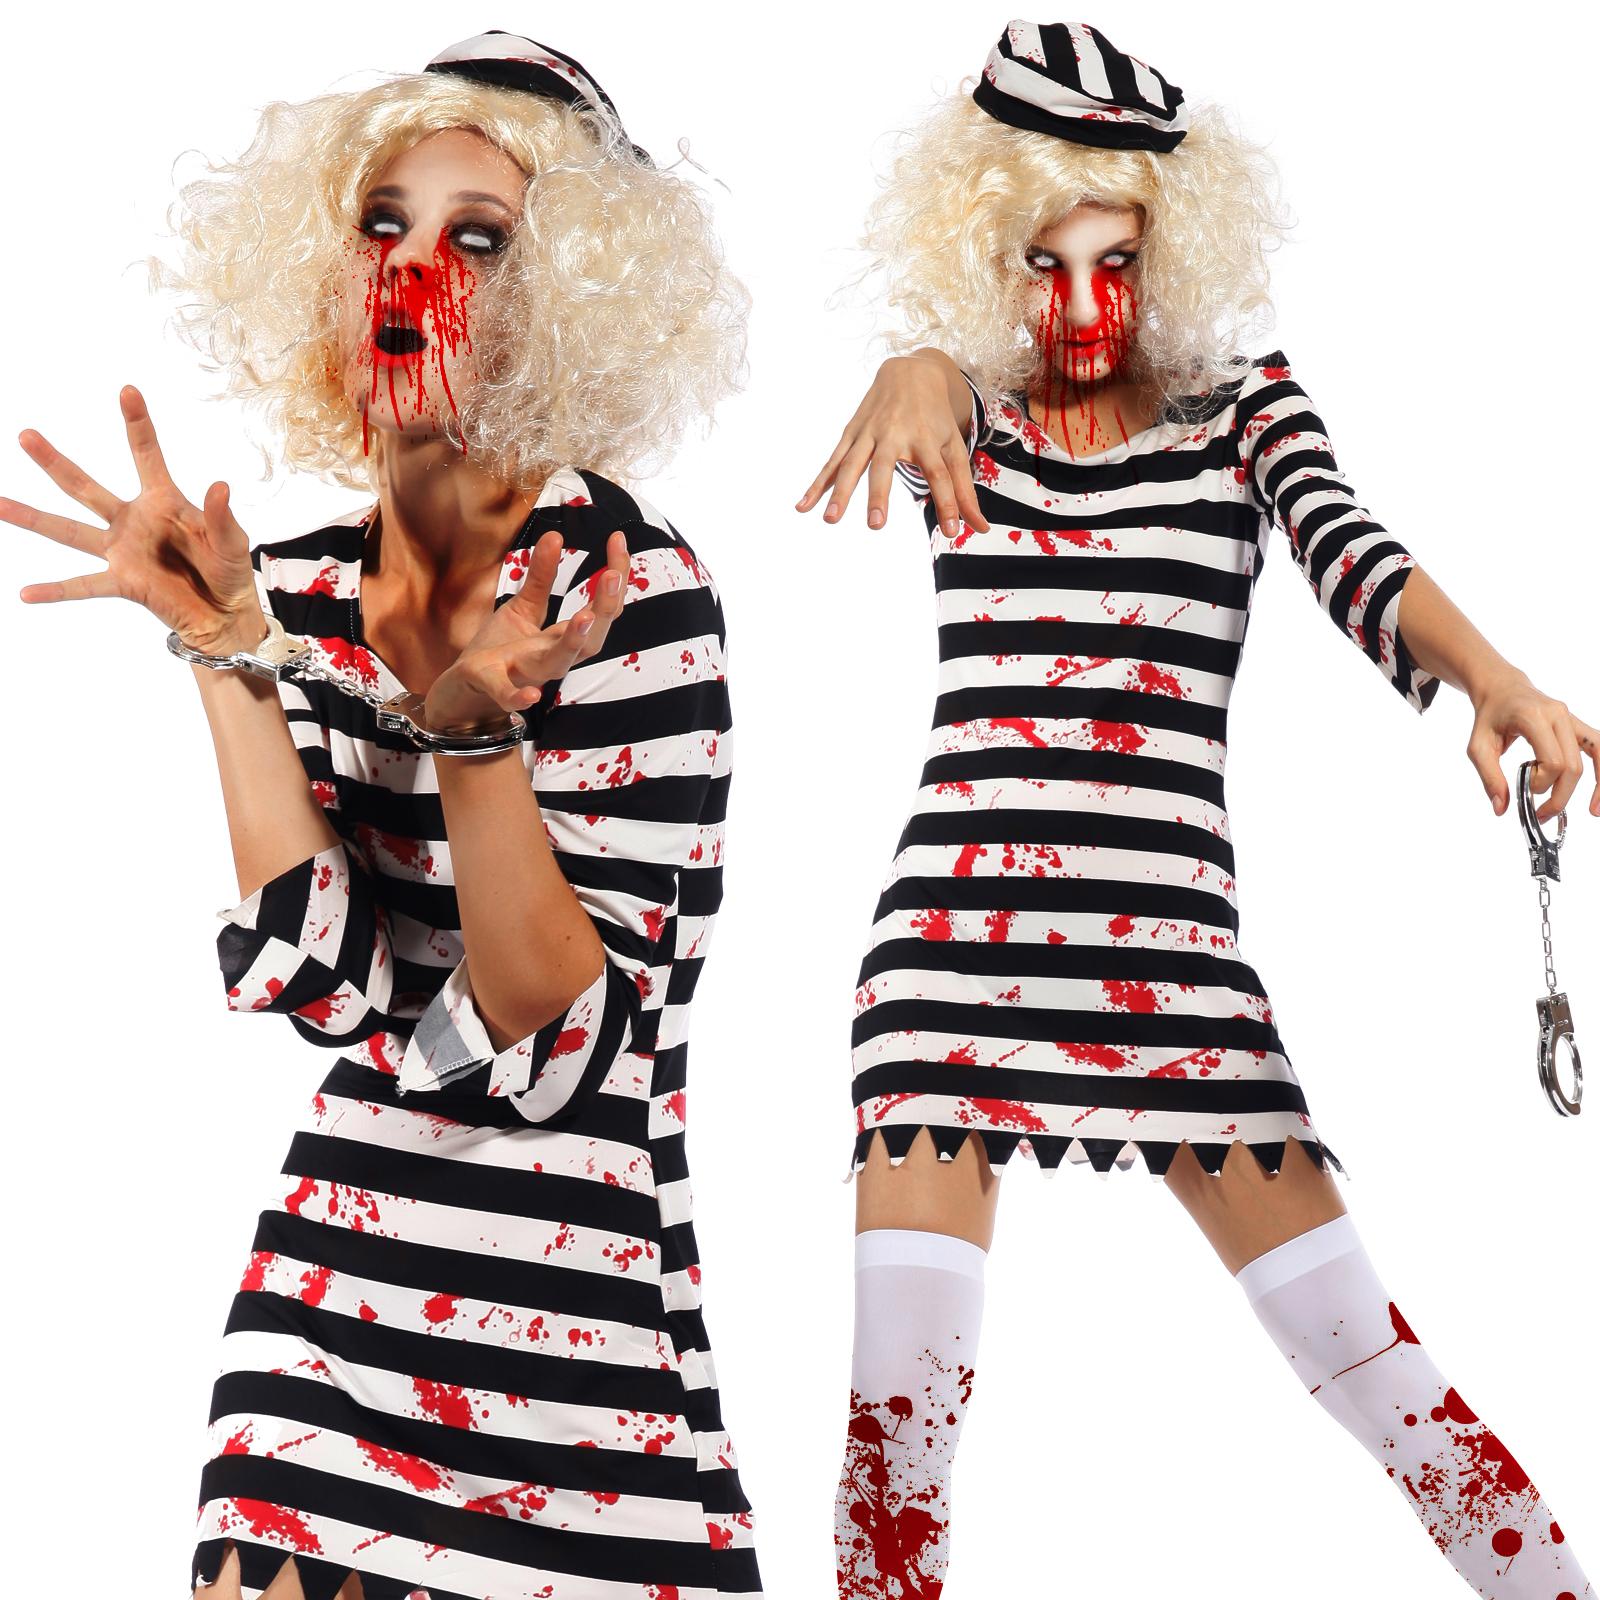 Scary Ladies Bloody Zombie Costume Walking Dead Cosplay Halloween ...